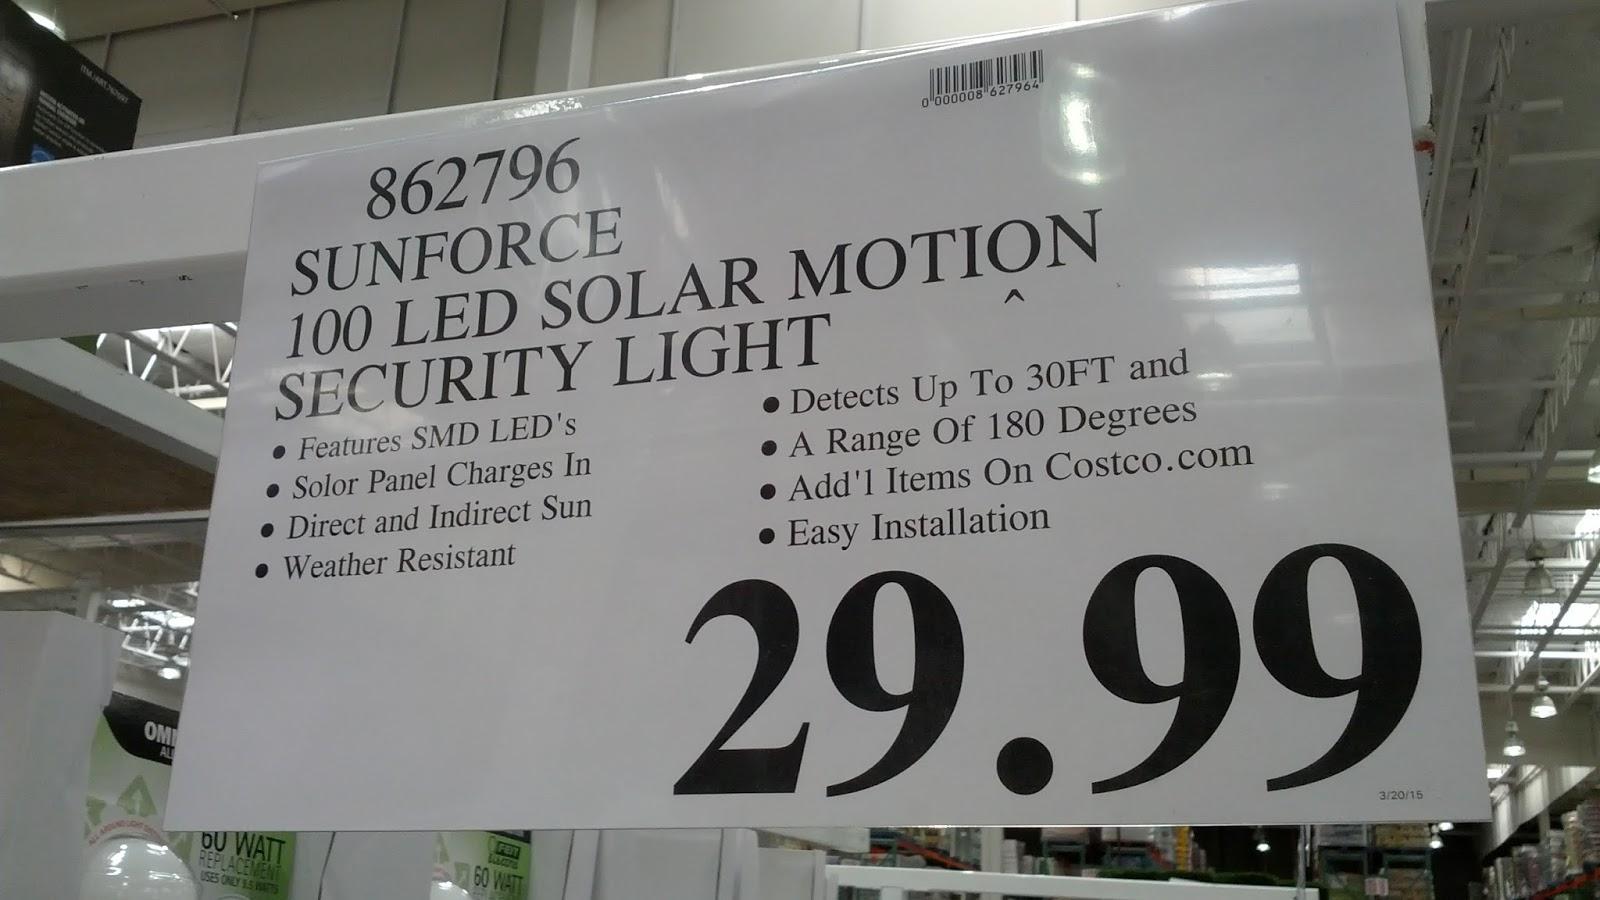 sunforce 100 led solar motion security light costco weekender Capstone Motion Senor Light deal for the sunforce 100 led solar motion security light at costco